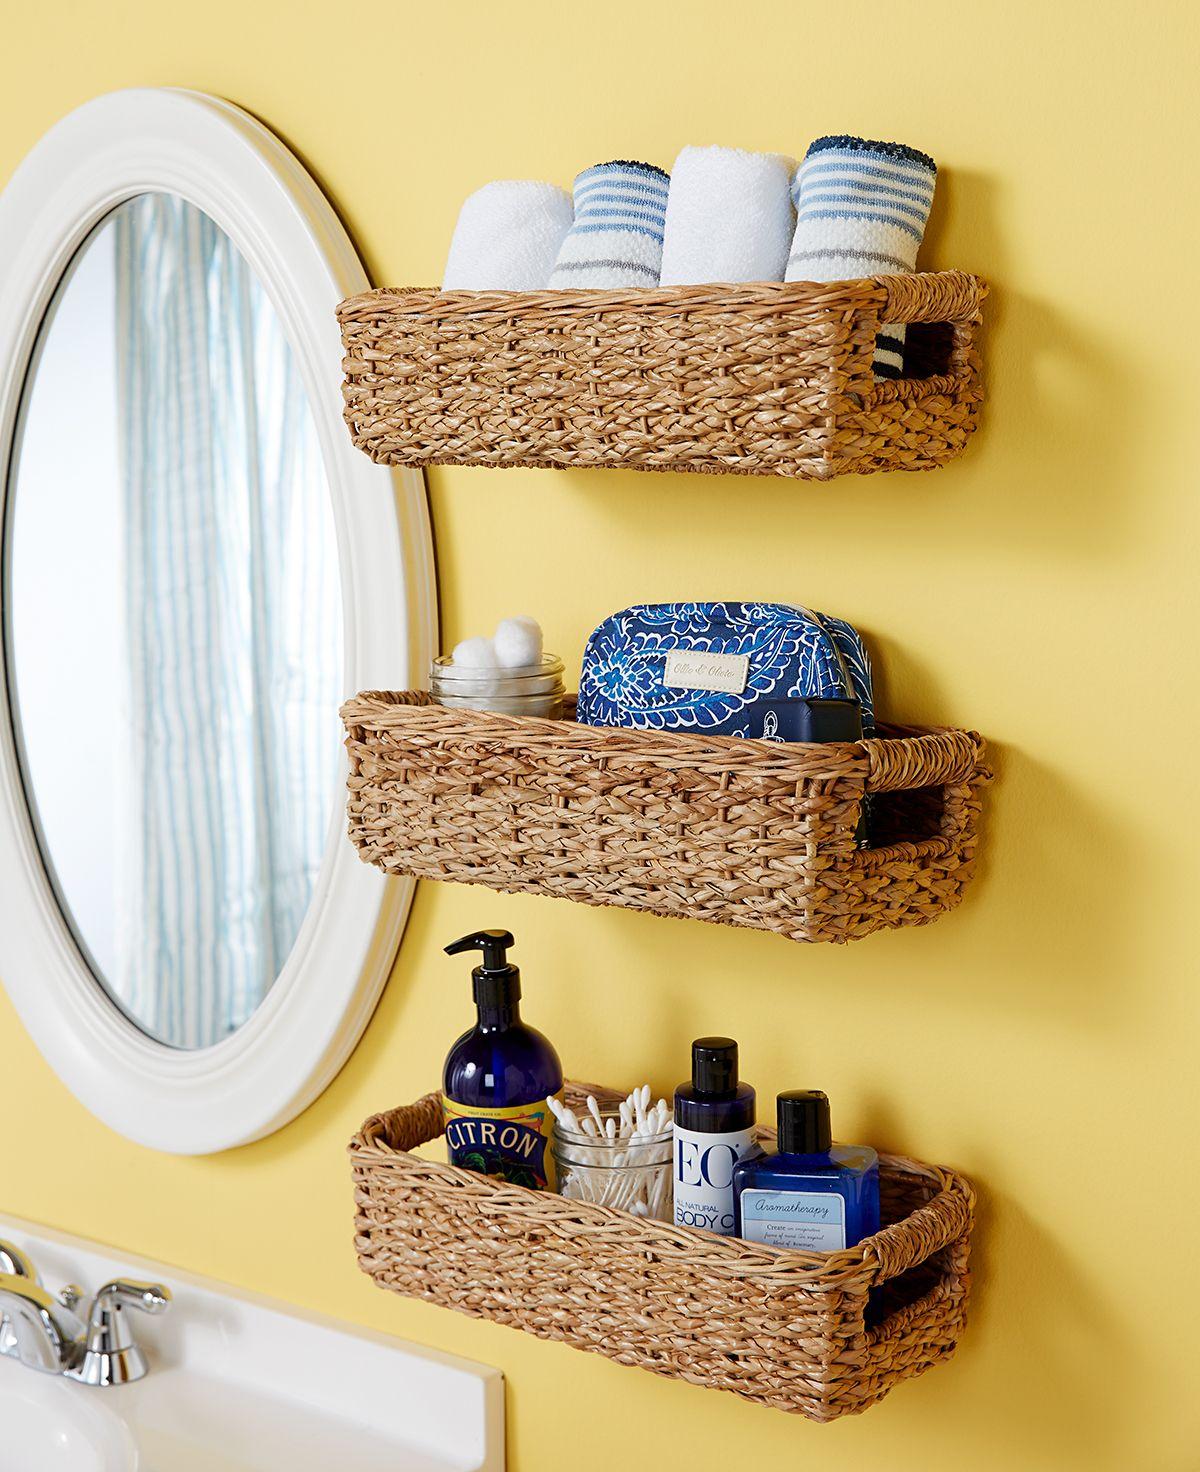 Bathroom Storage Baskets Ideas